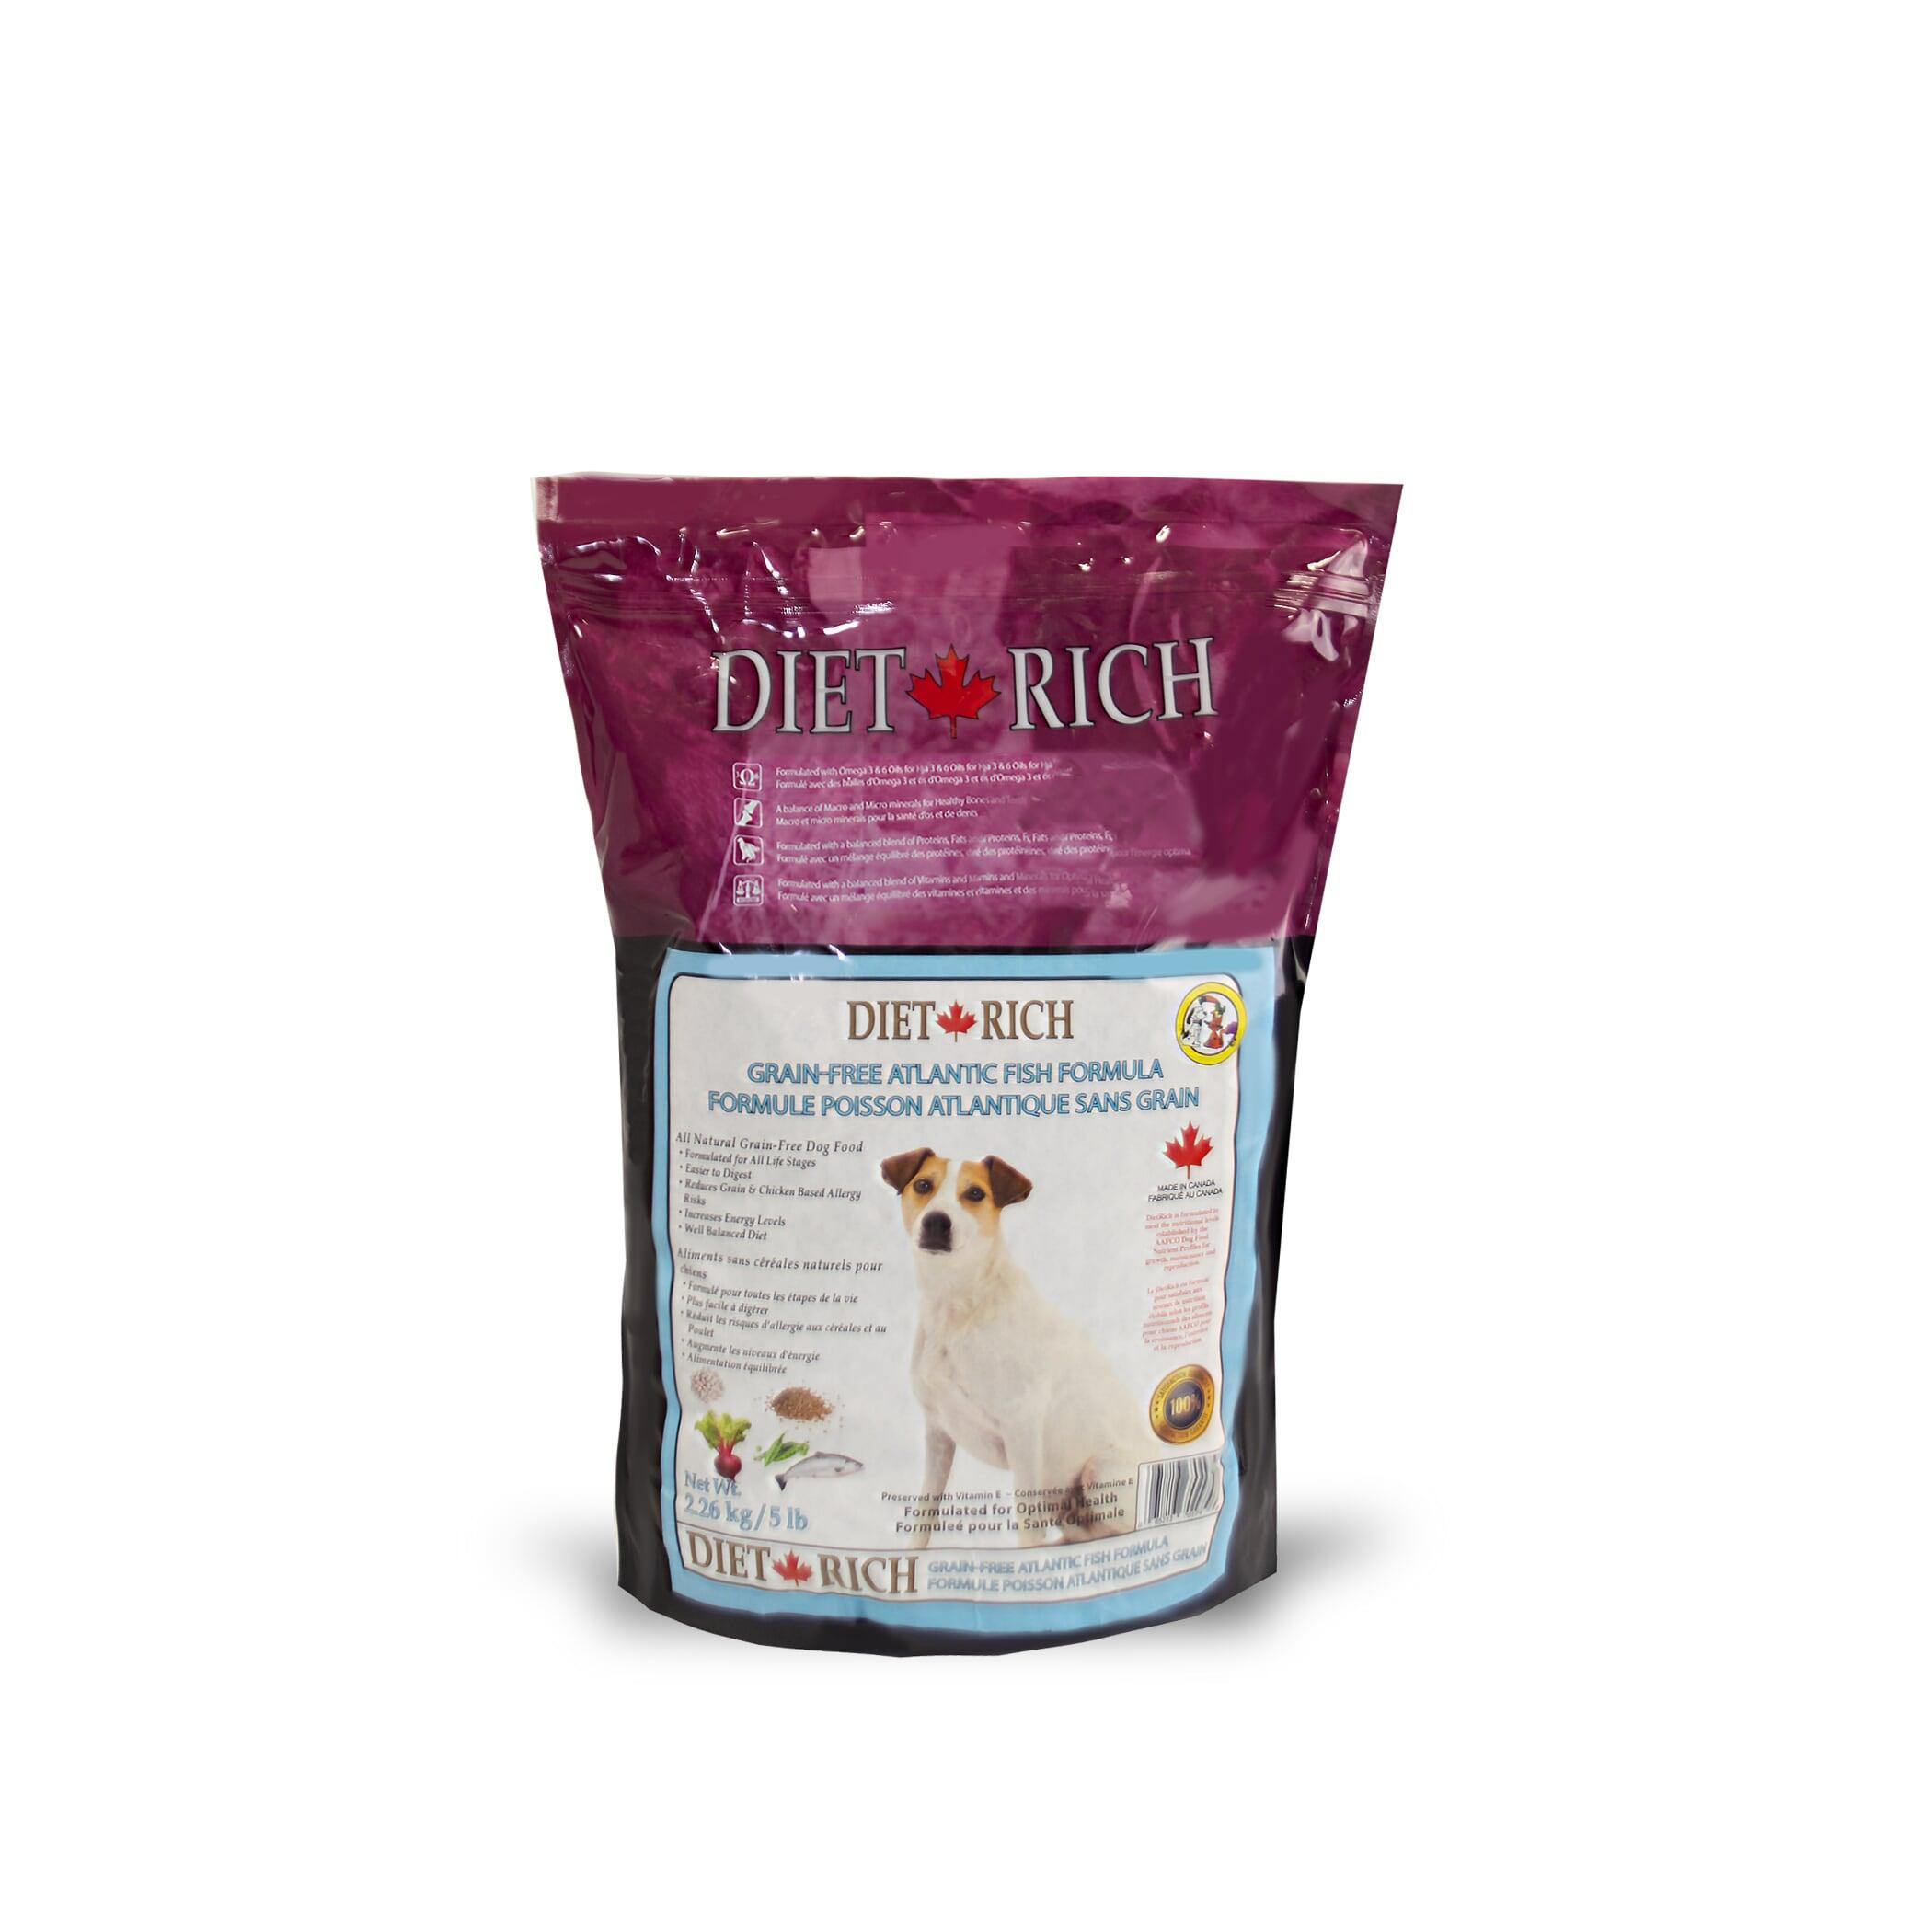 Dietrich Atlantic Fish Grain-Free Dry Dog Food Image